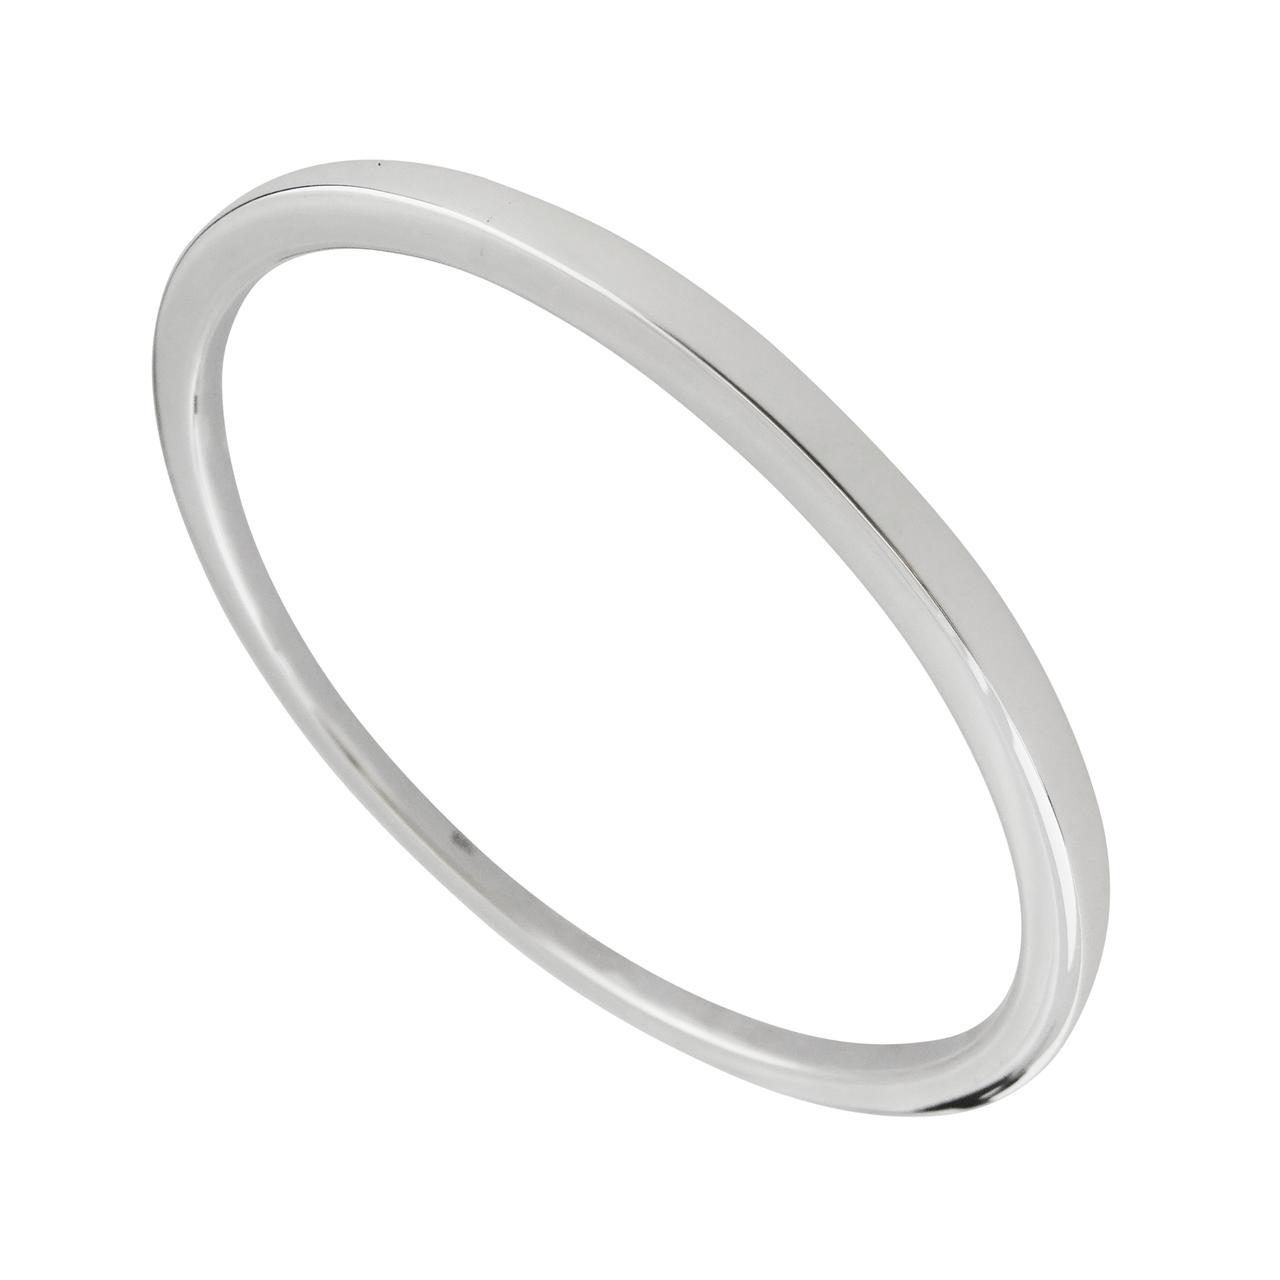 ''8.5'''' Plain Round BANGLE Bracelet - 925 Sterling Silver - Hollow Lightweight''